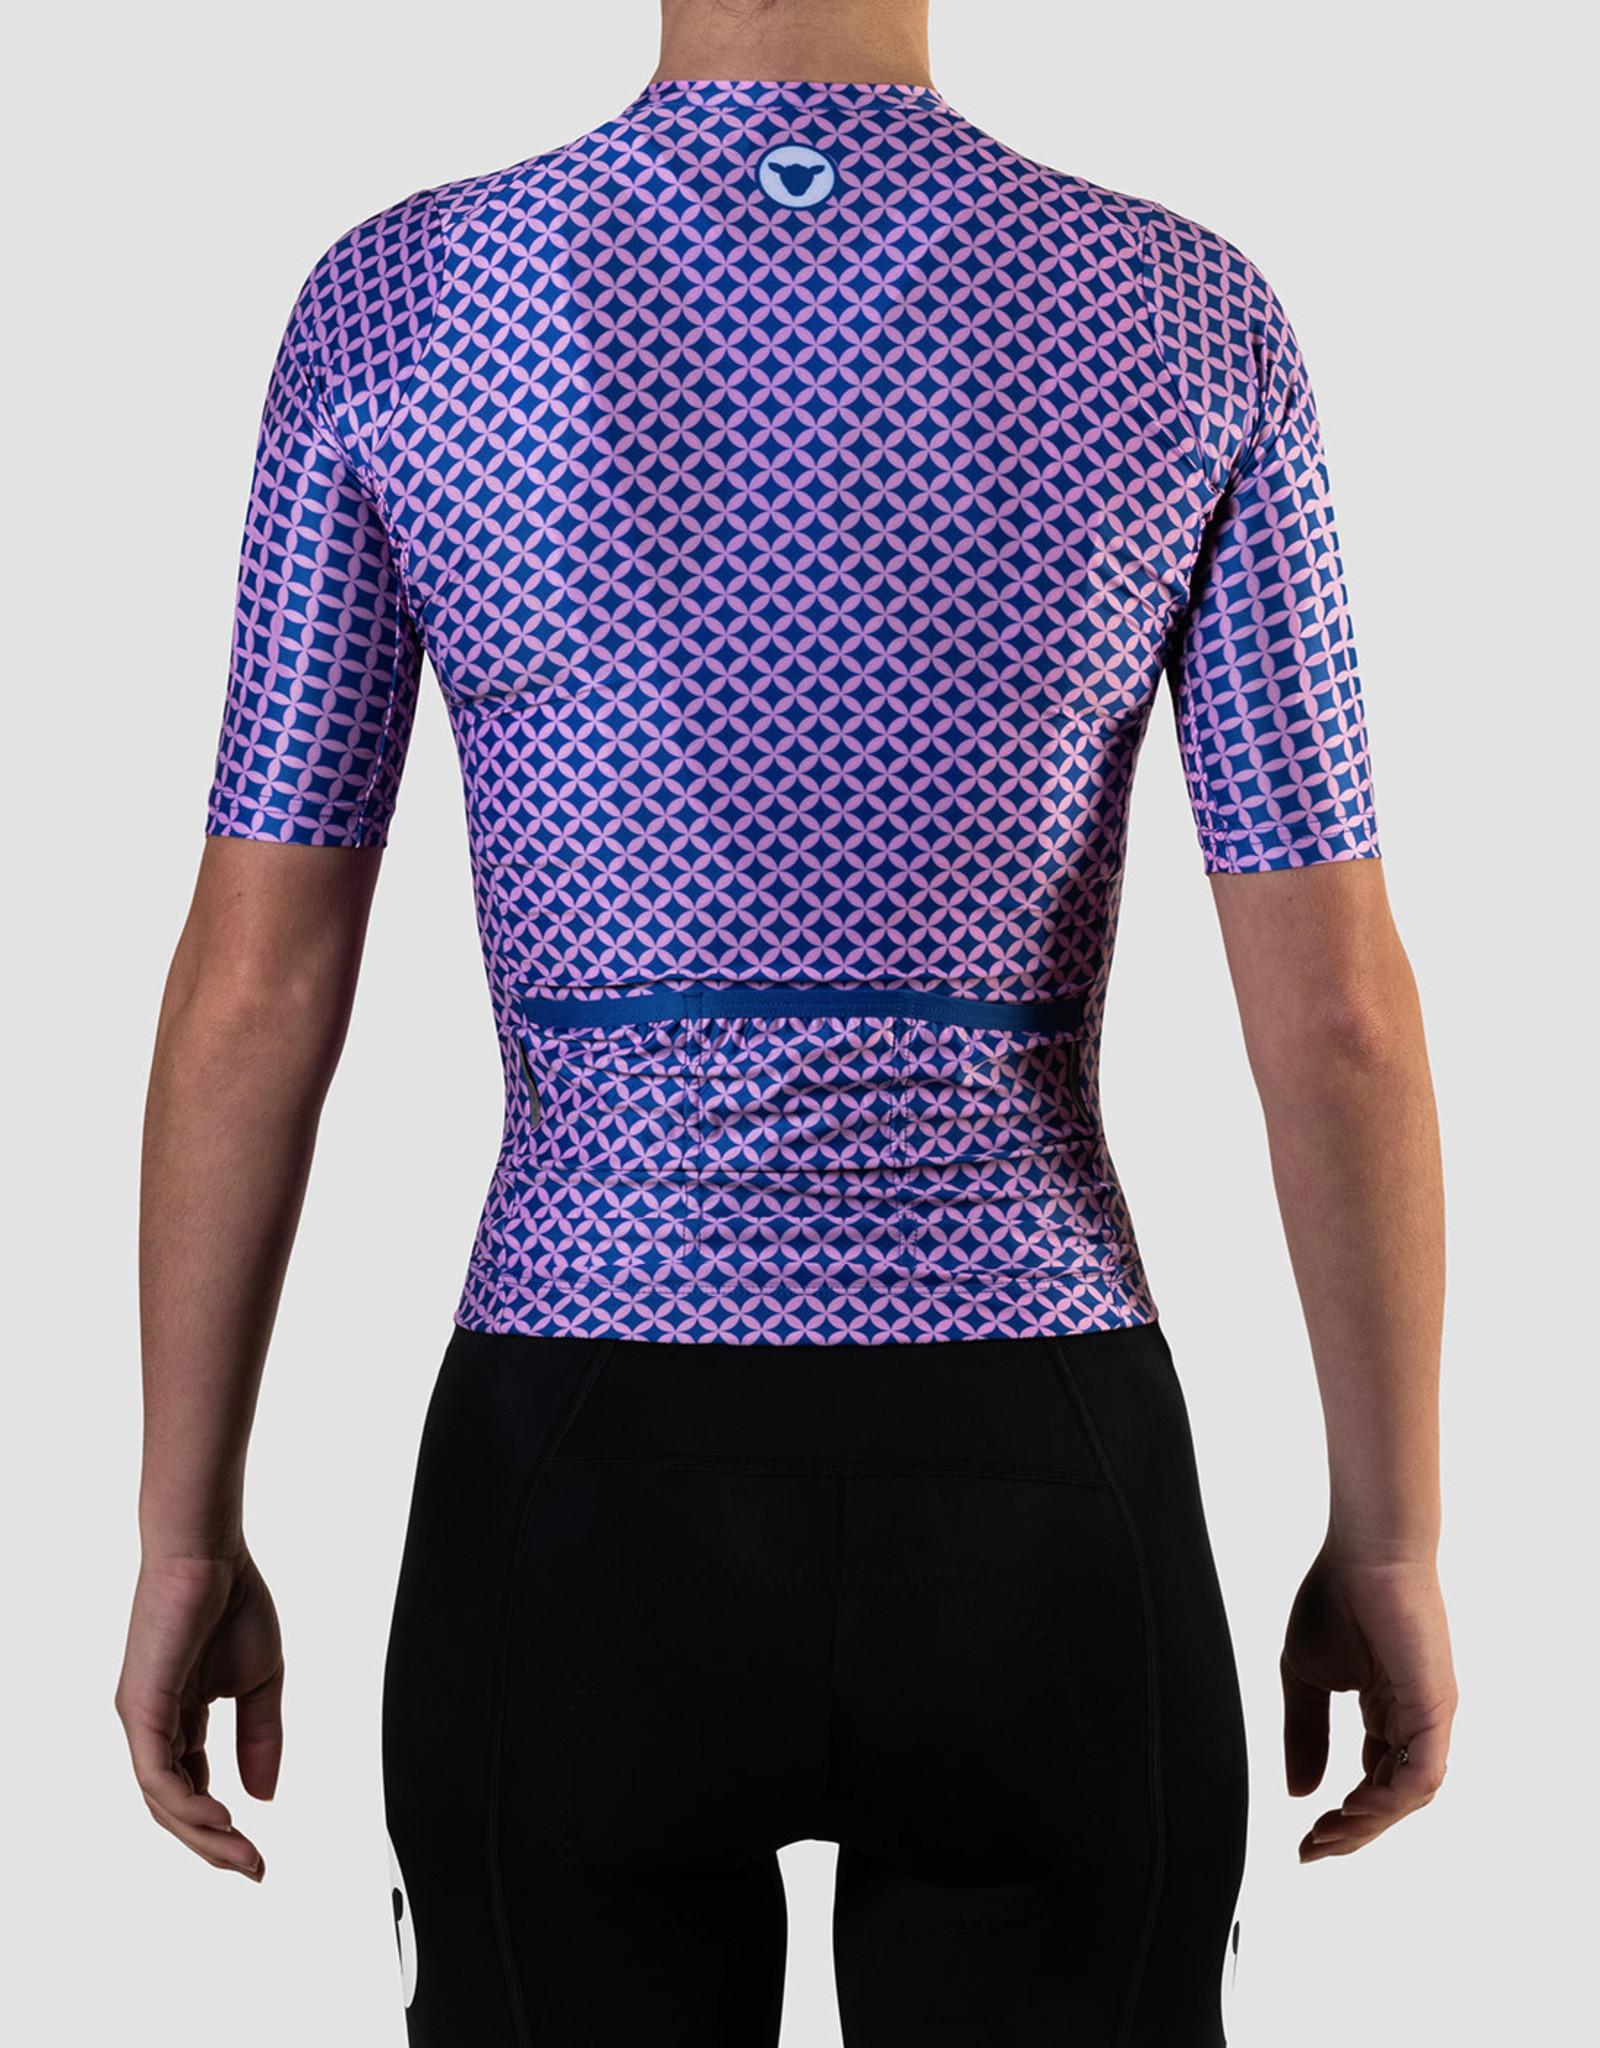 Black Sheep Cycling Women's LTD Tokyo jersey - Shippo